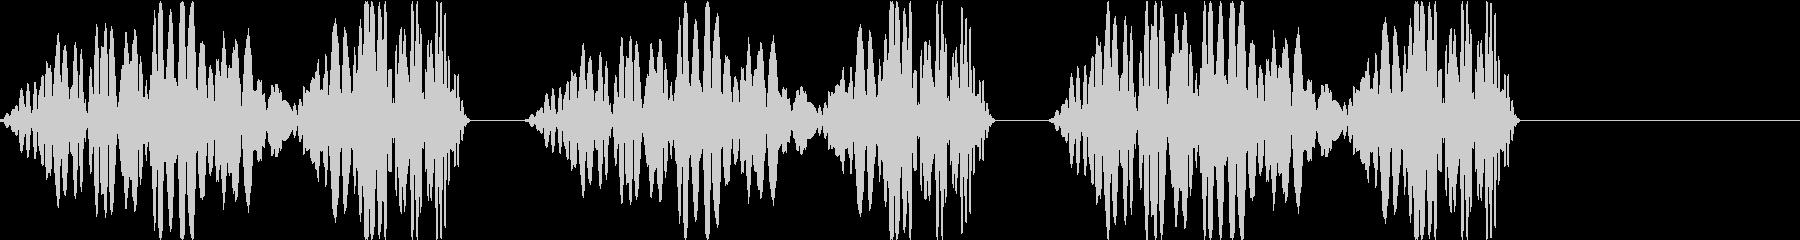 DJプレイ スクラッチ・ノイズ 253の未再生の波形